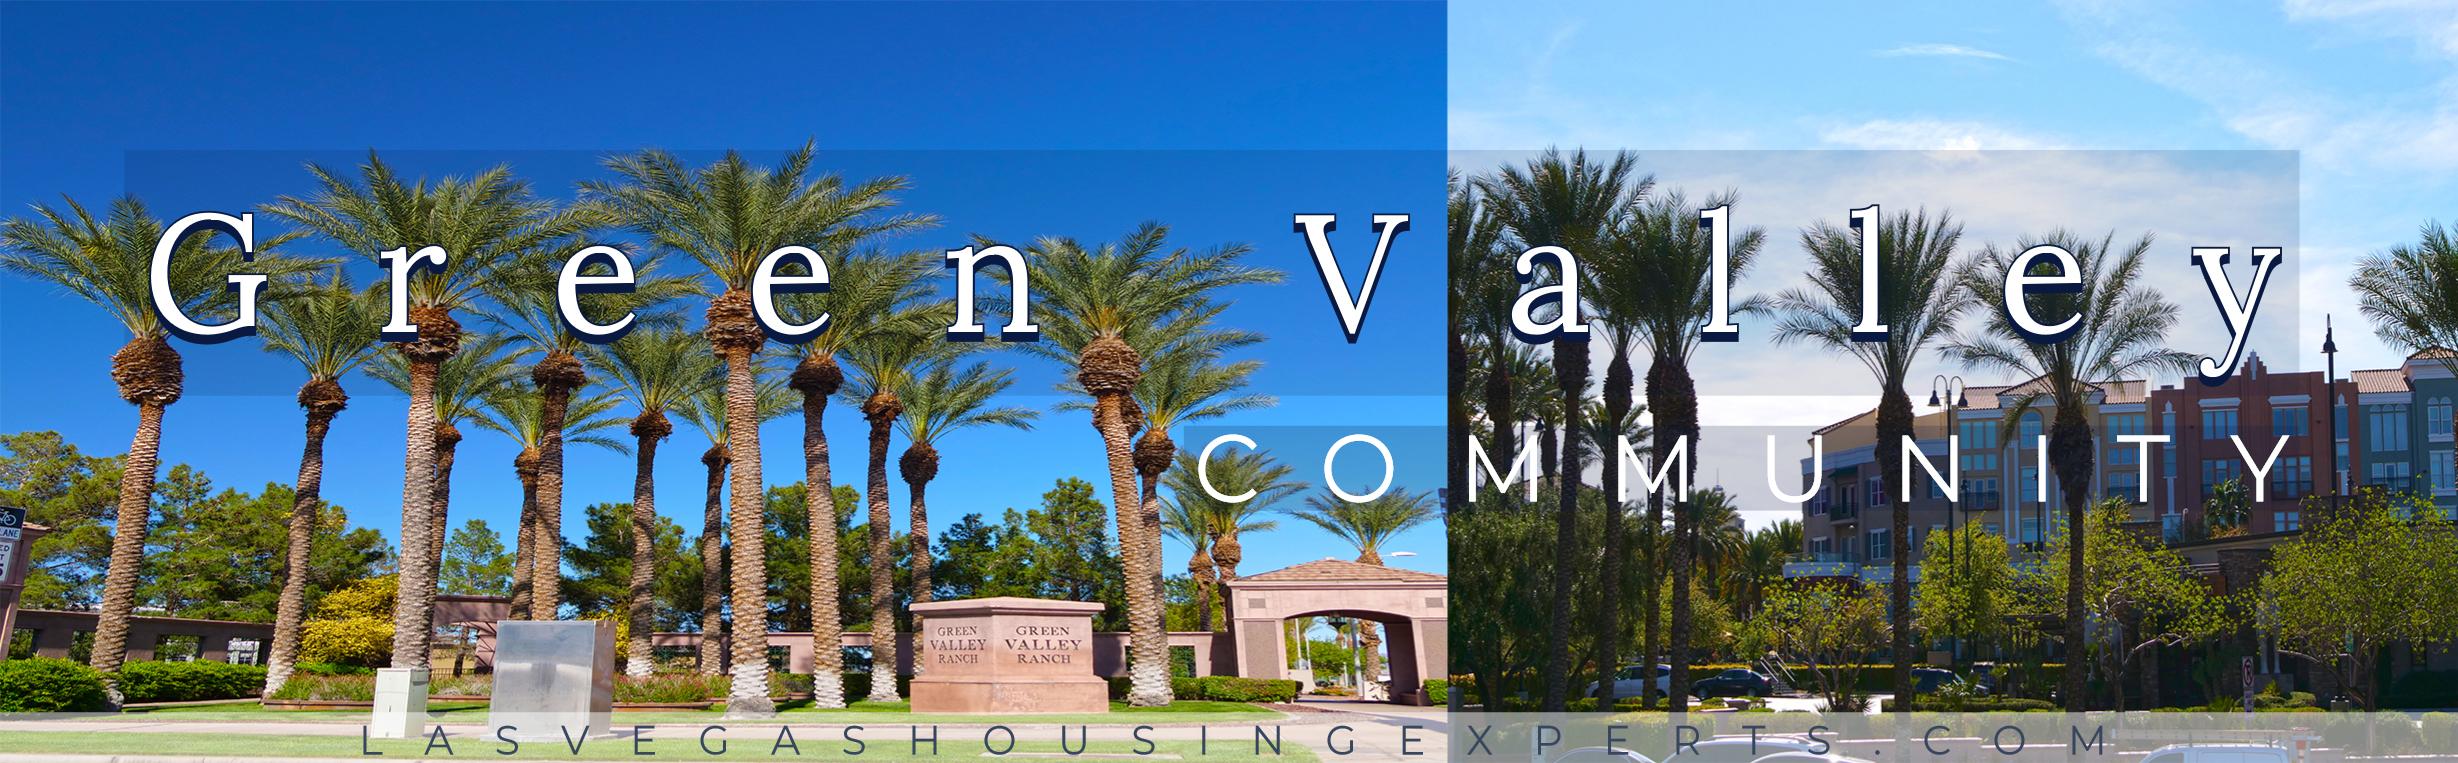 Green Valley Las Vegas Housing Experts